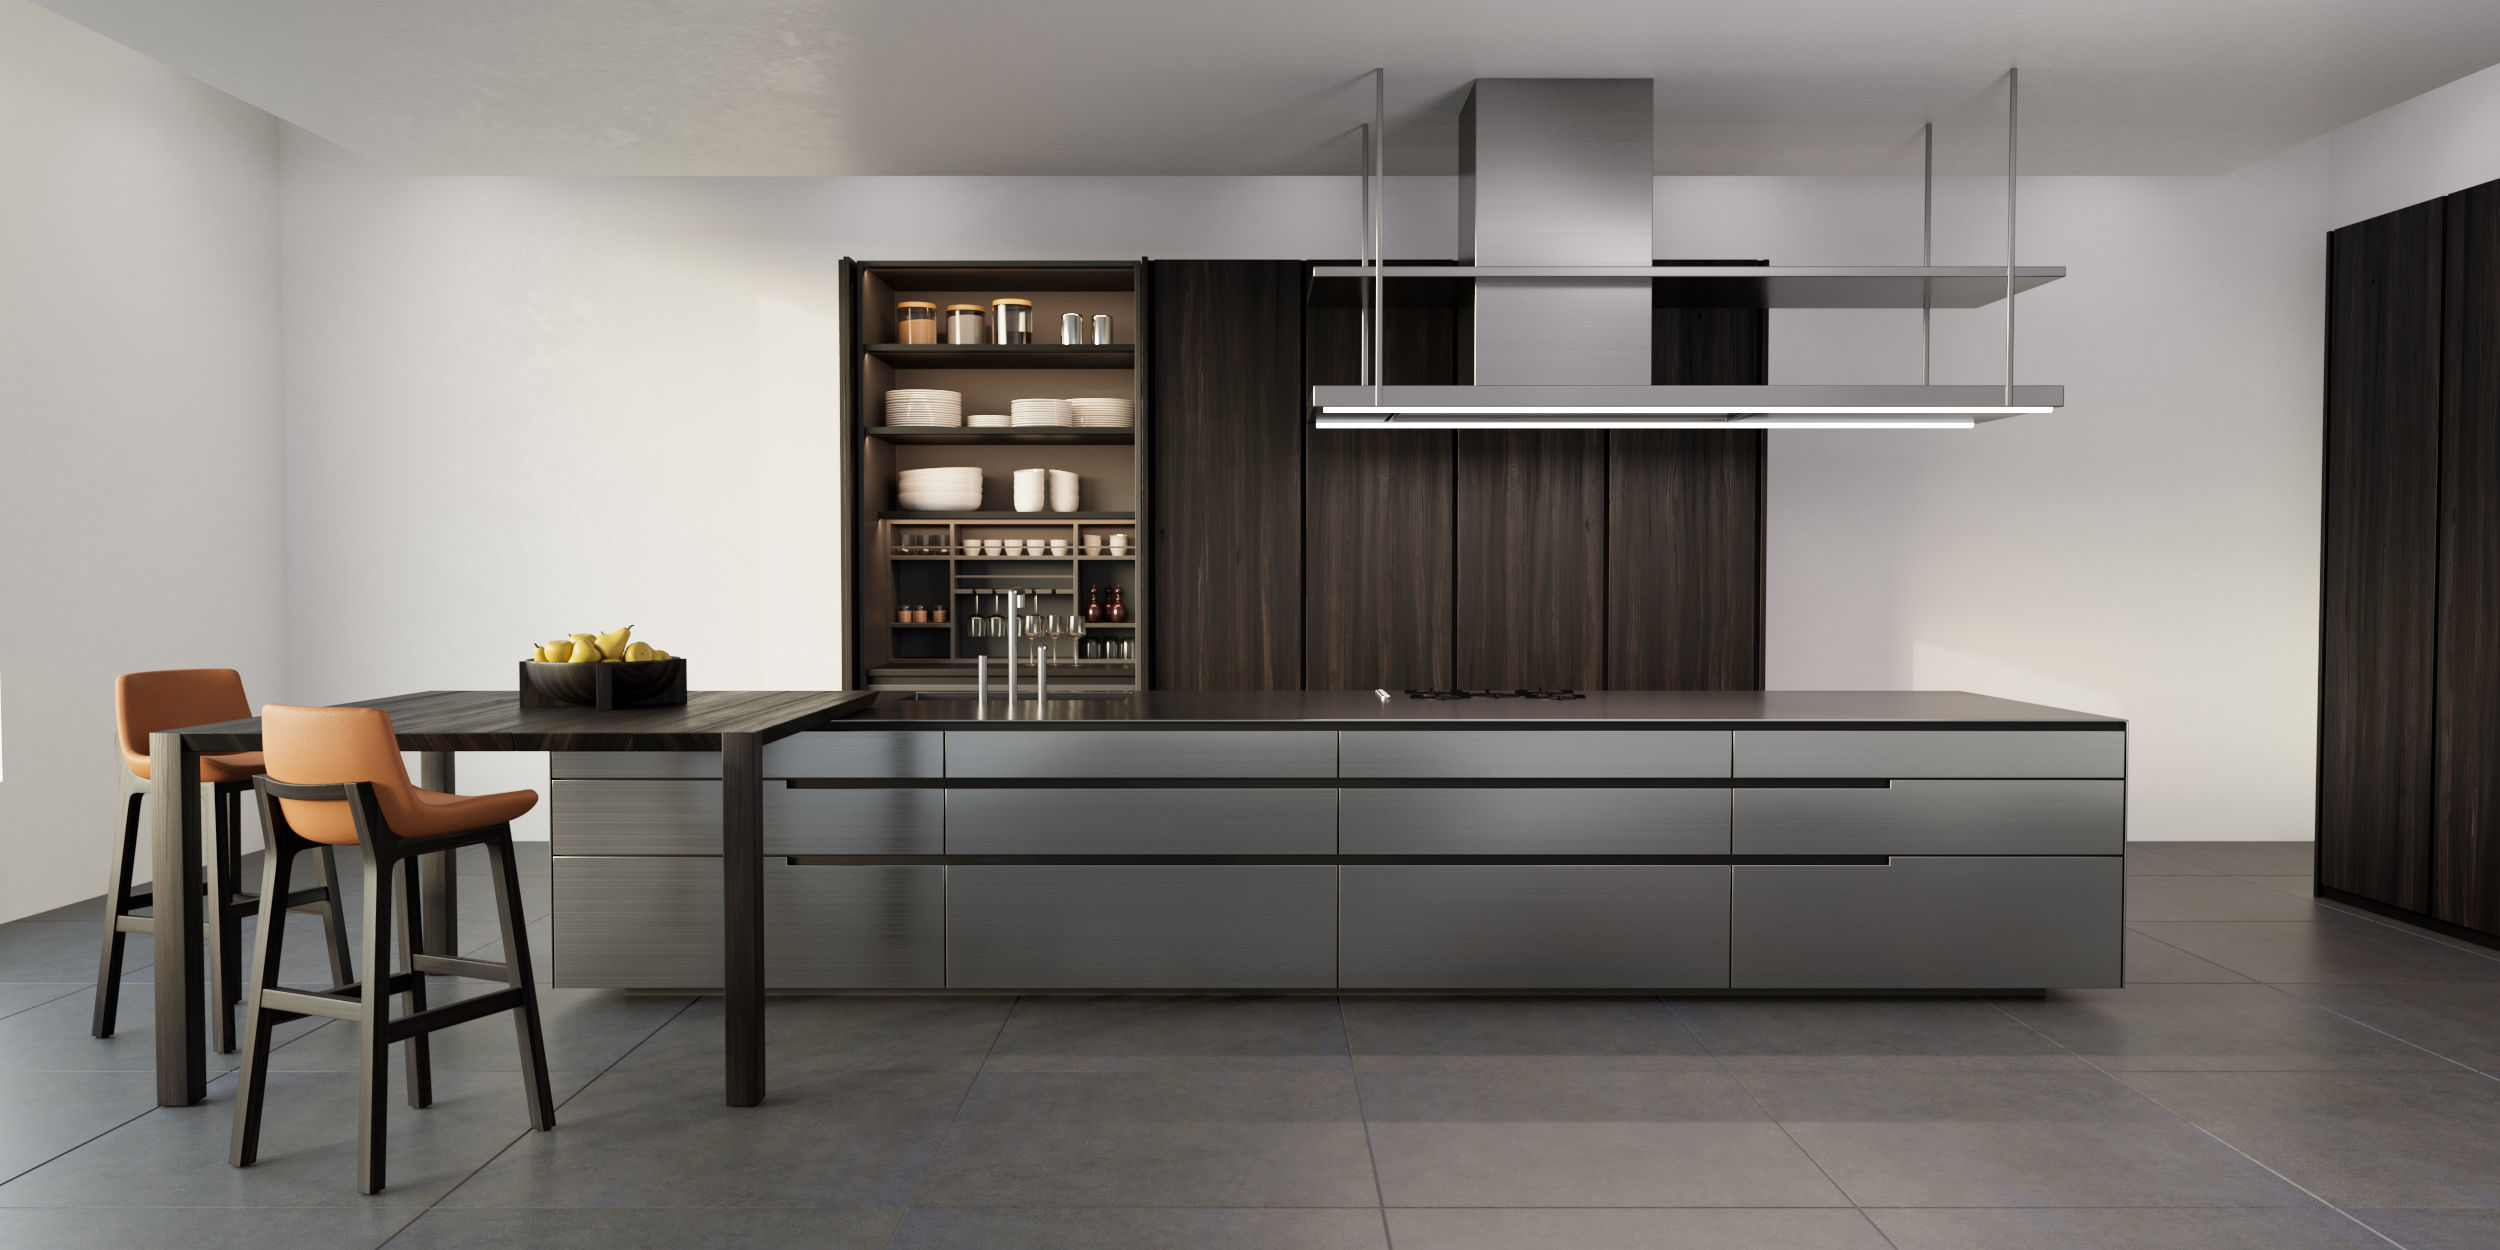 3D Poliform PHOENIX kitchen | CGTrader on Model Kitchens  id=35728